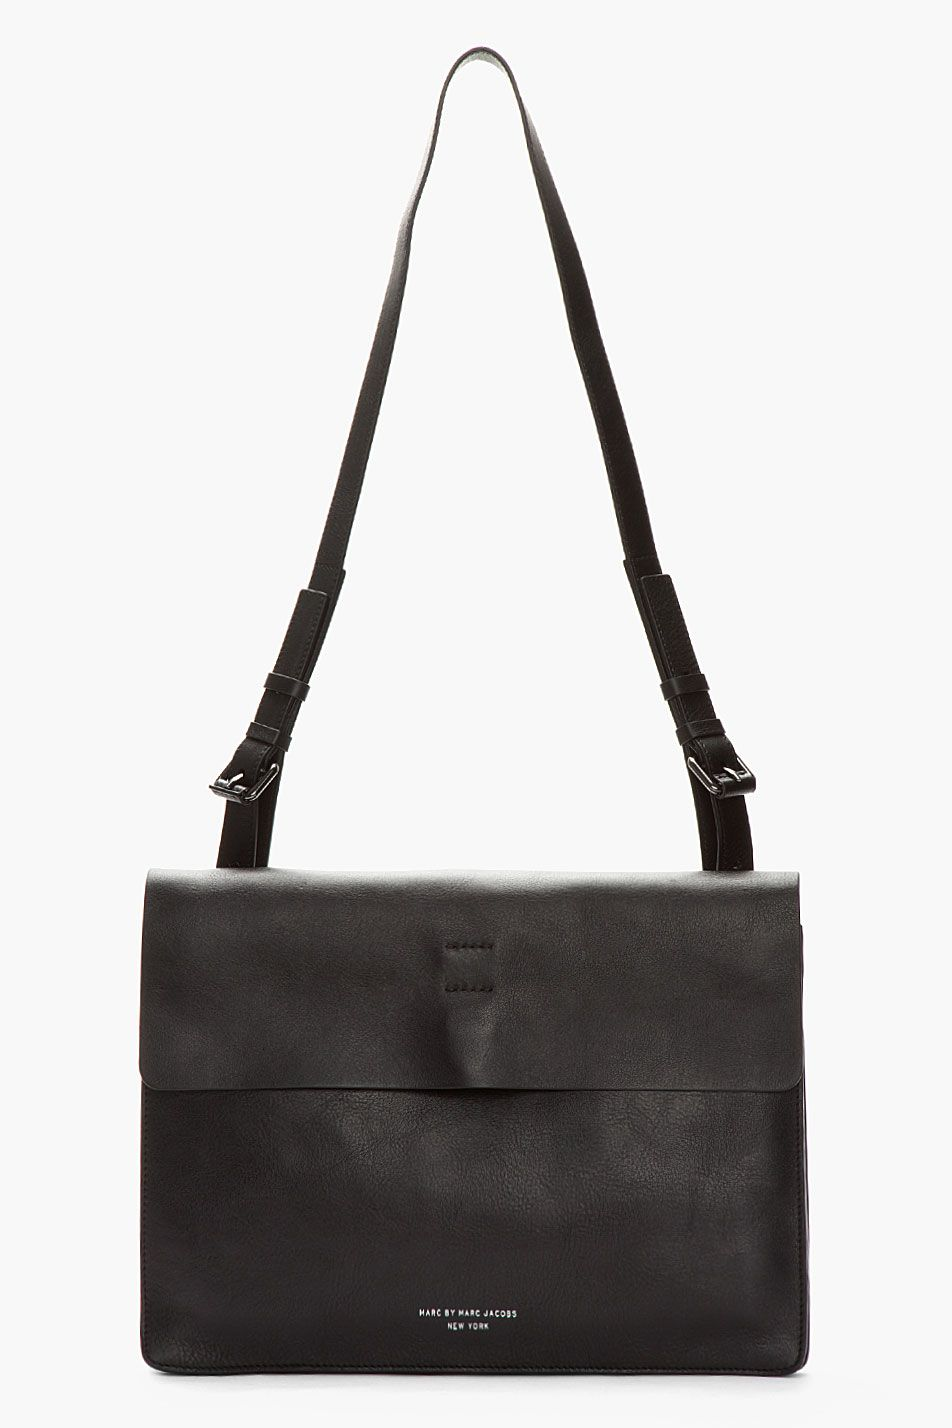 e474fe7a2 MARC BY MARC JACOBS Black Leather Werdie Boy Portfolio Messenger Bag ...